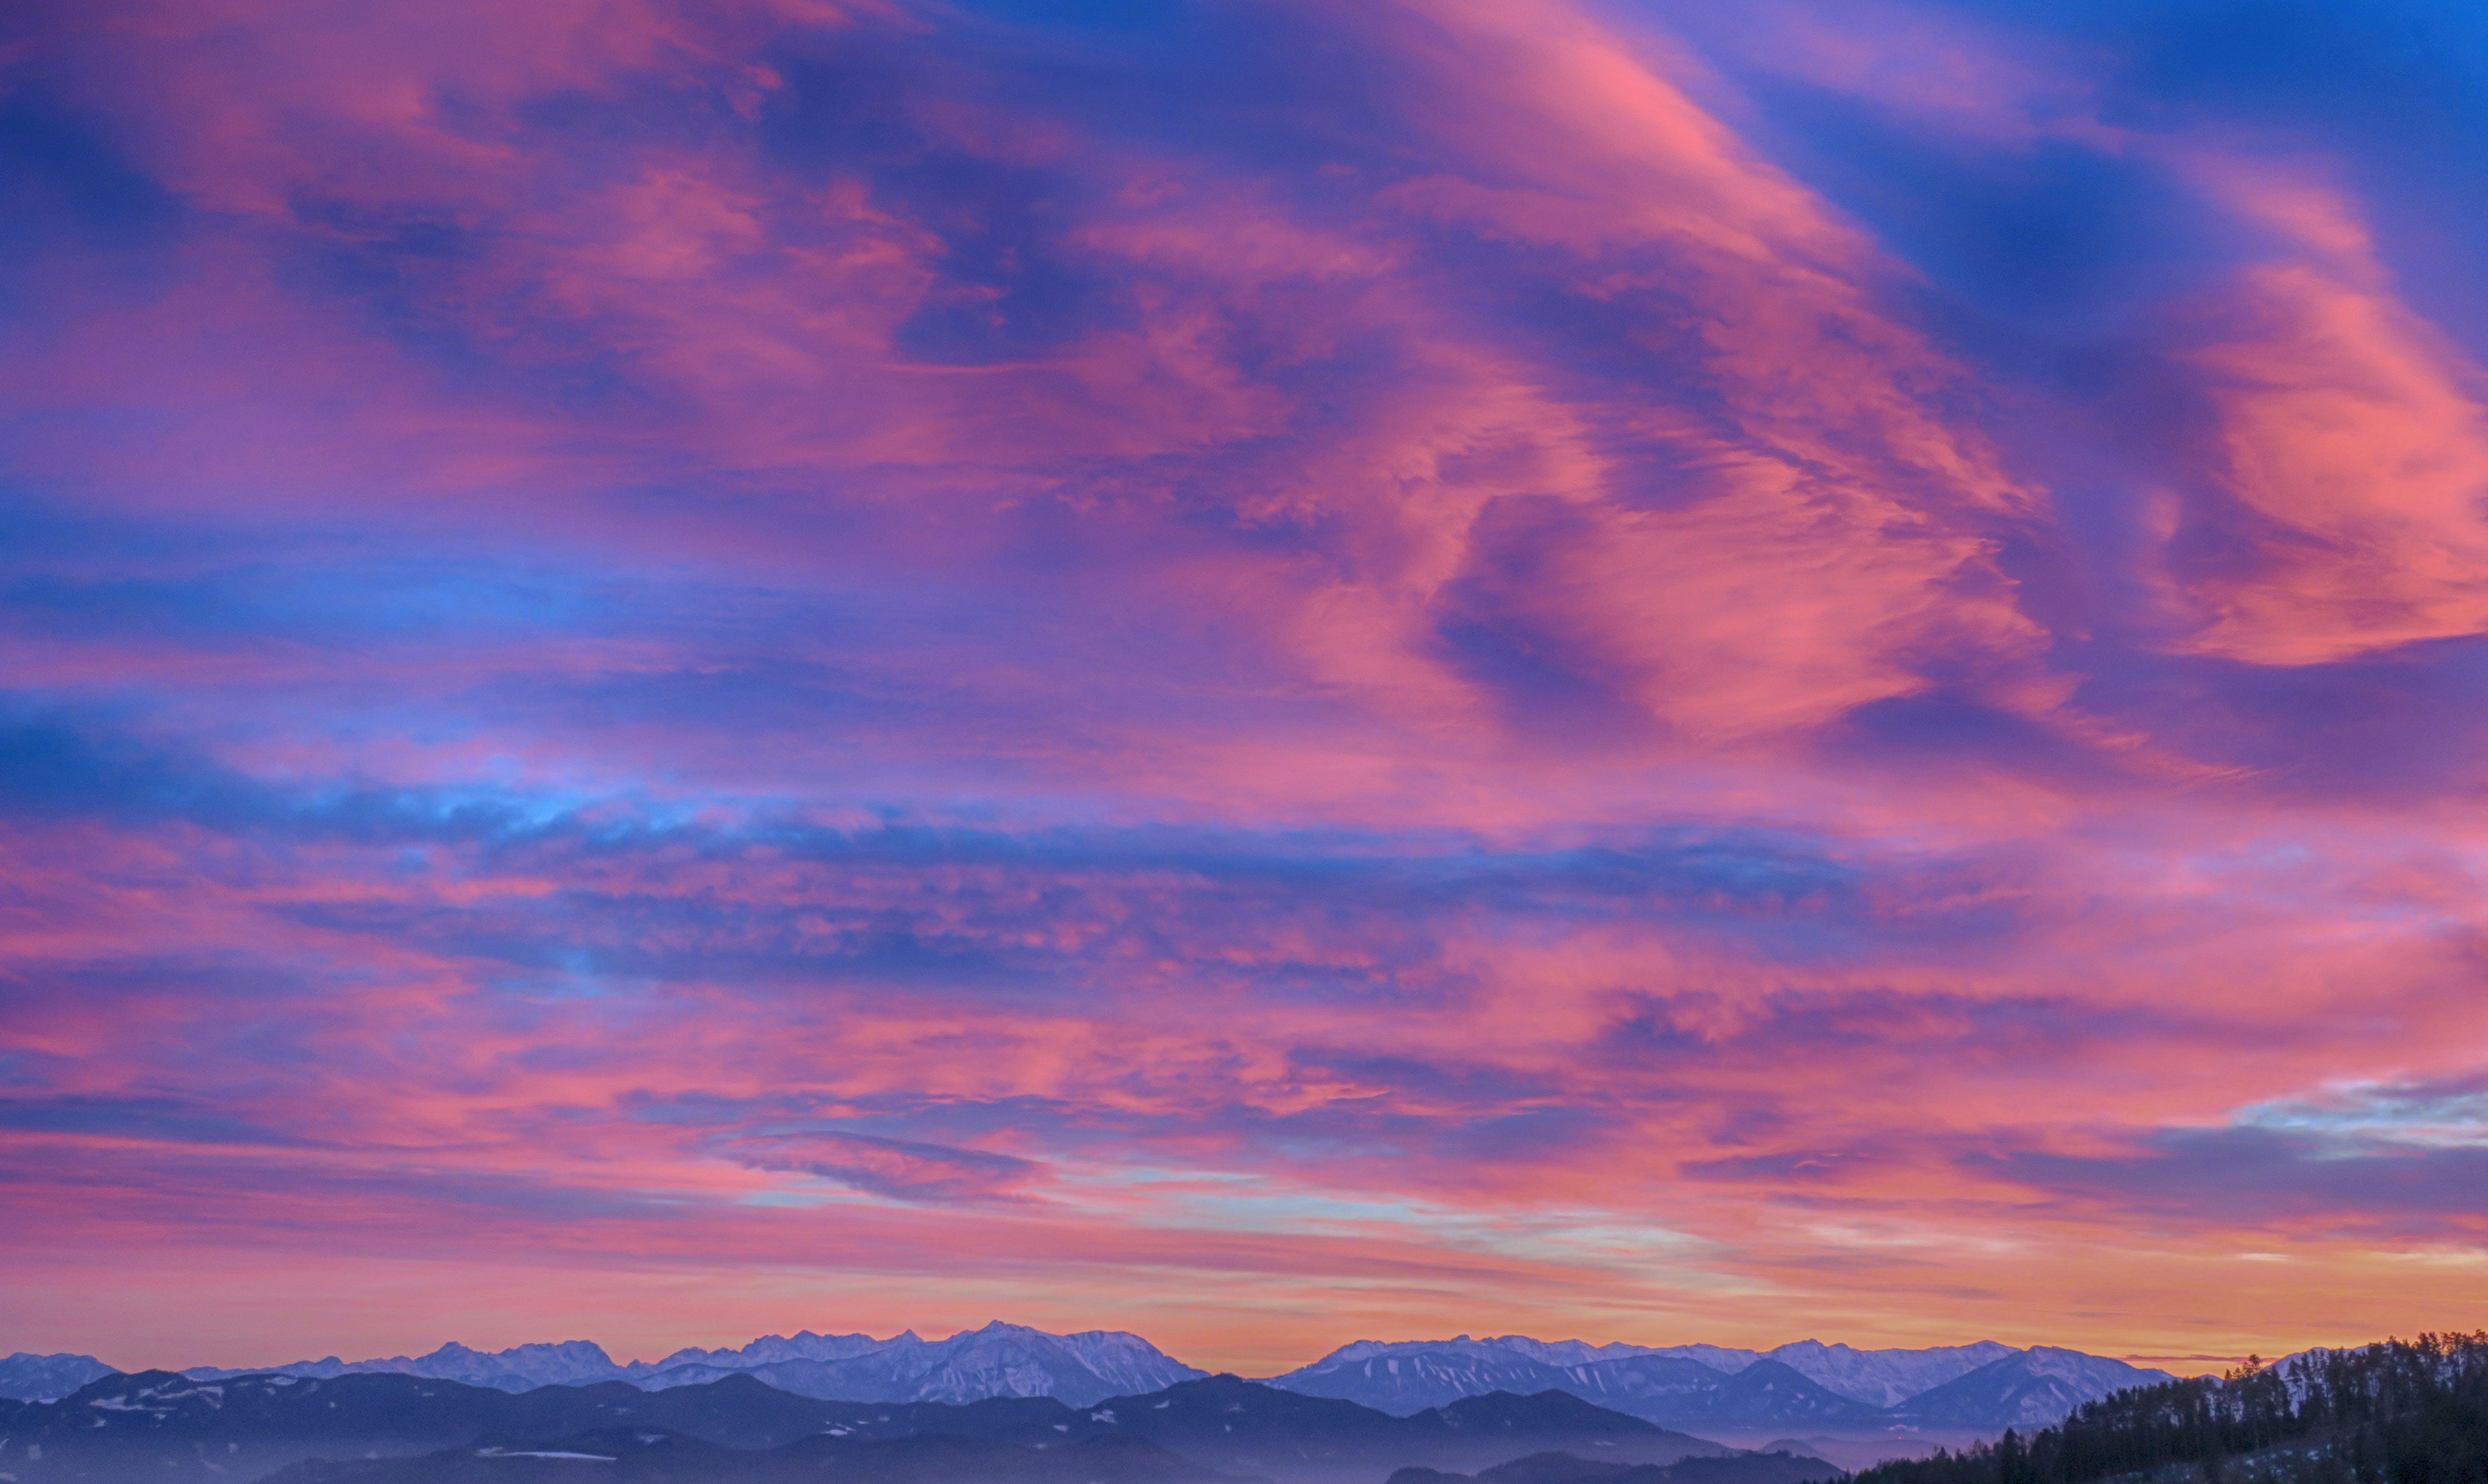 Landscape Photograph of Sky